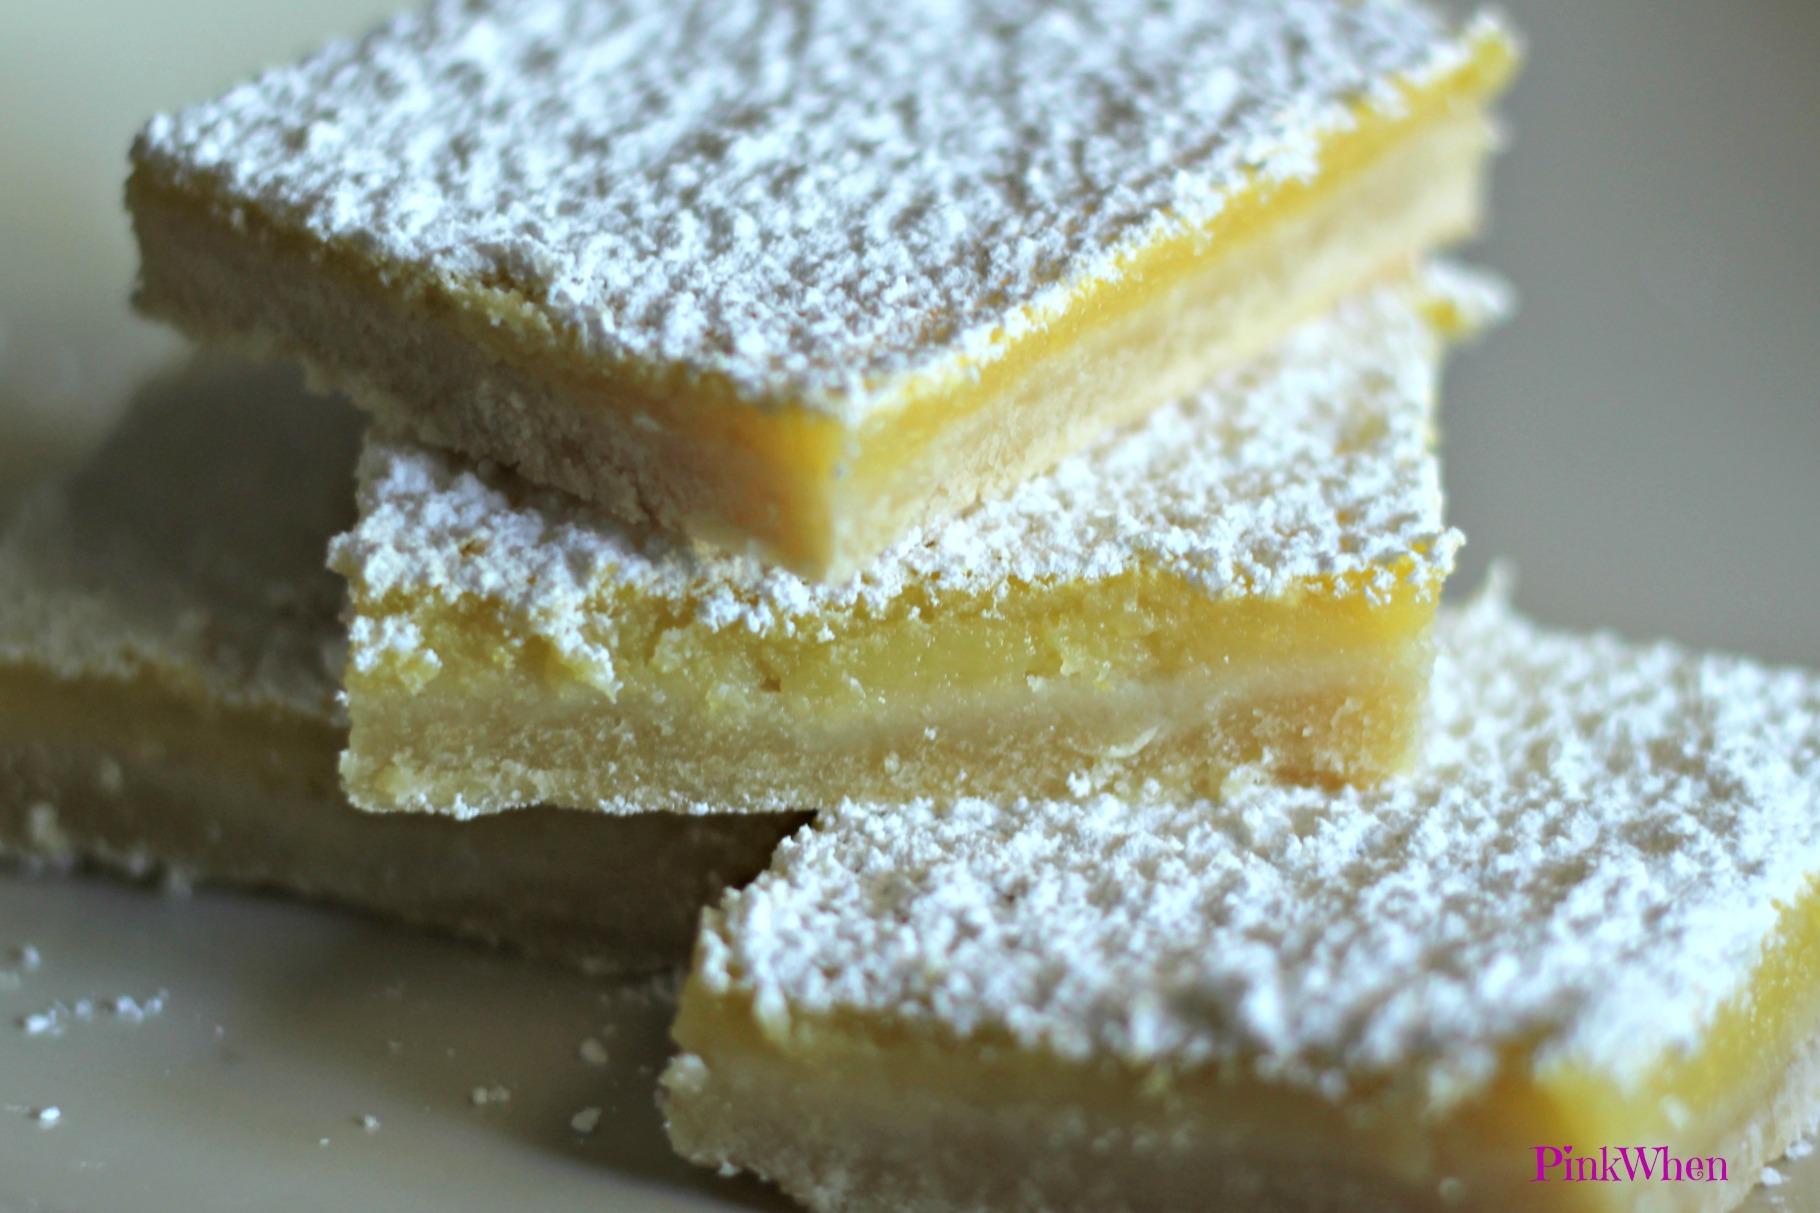 LemonBarsIMG_5055